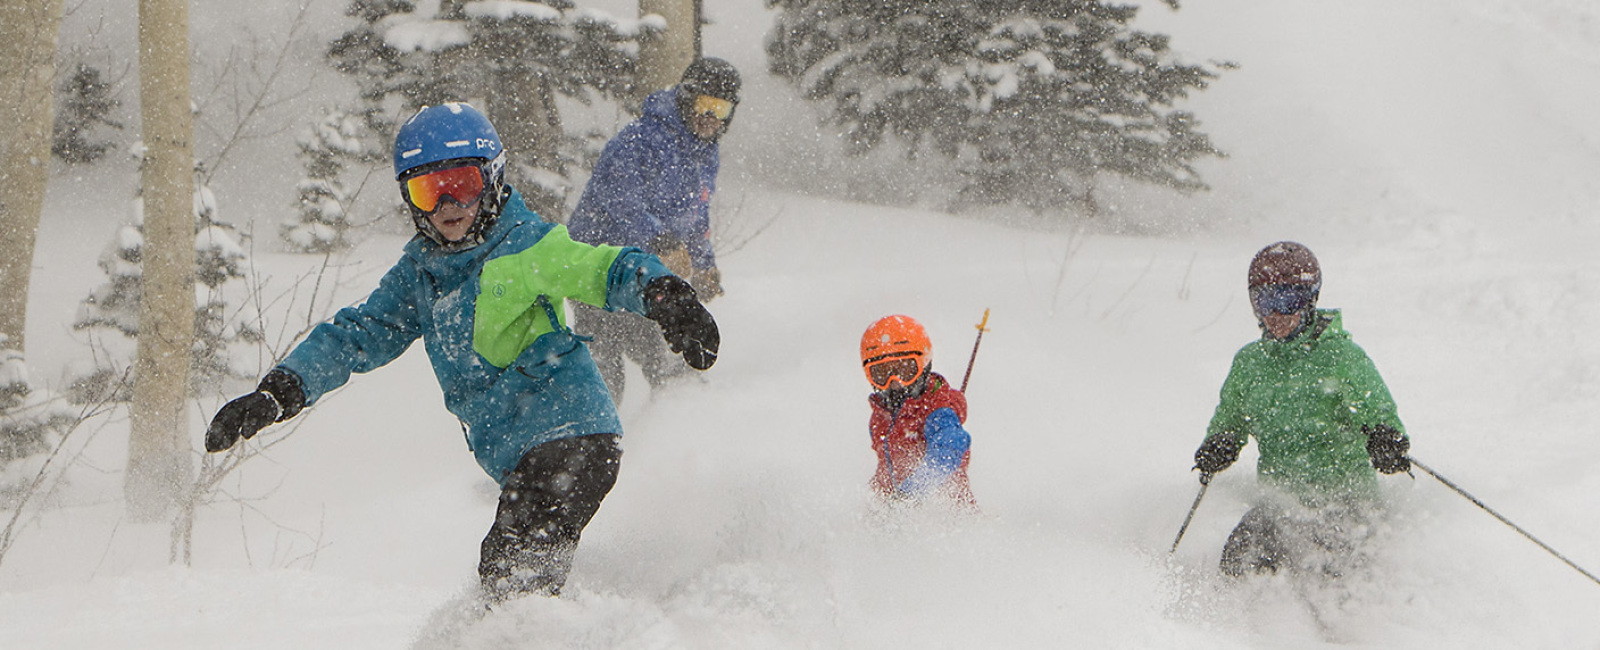 Breeze Ski Rentals - Newpark